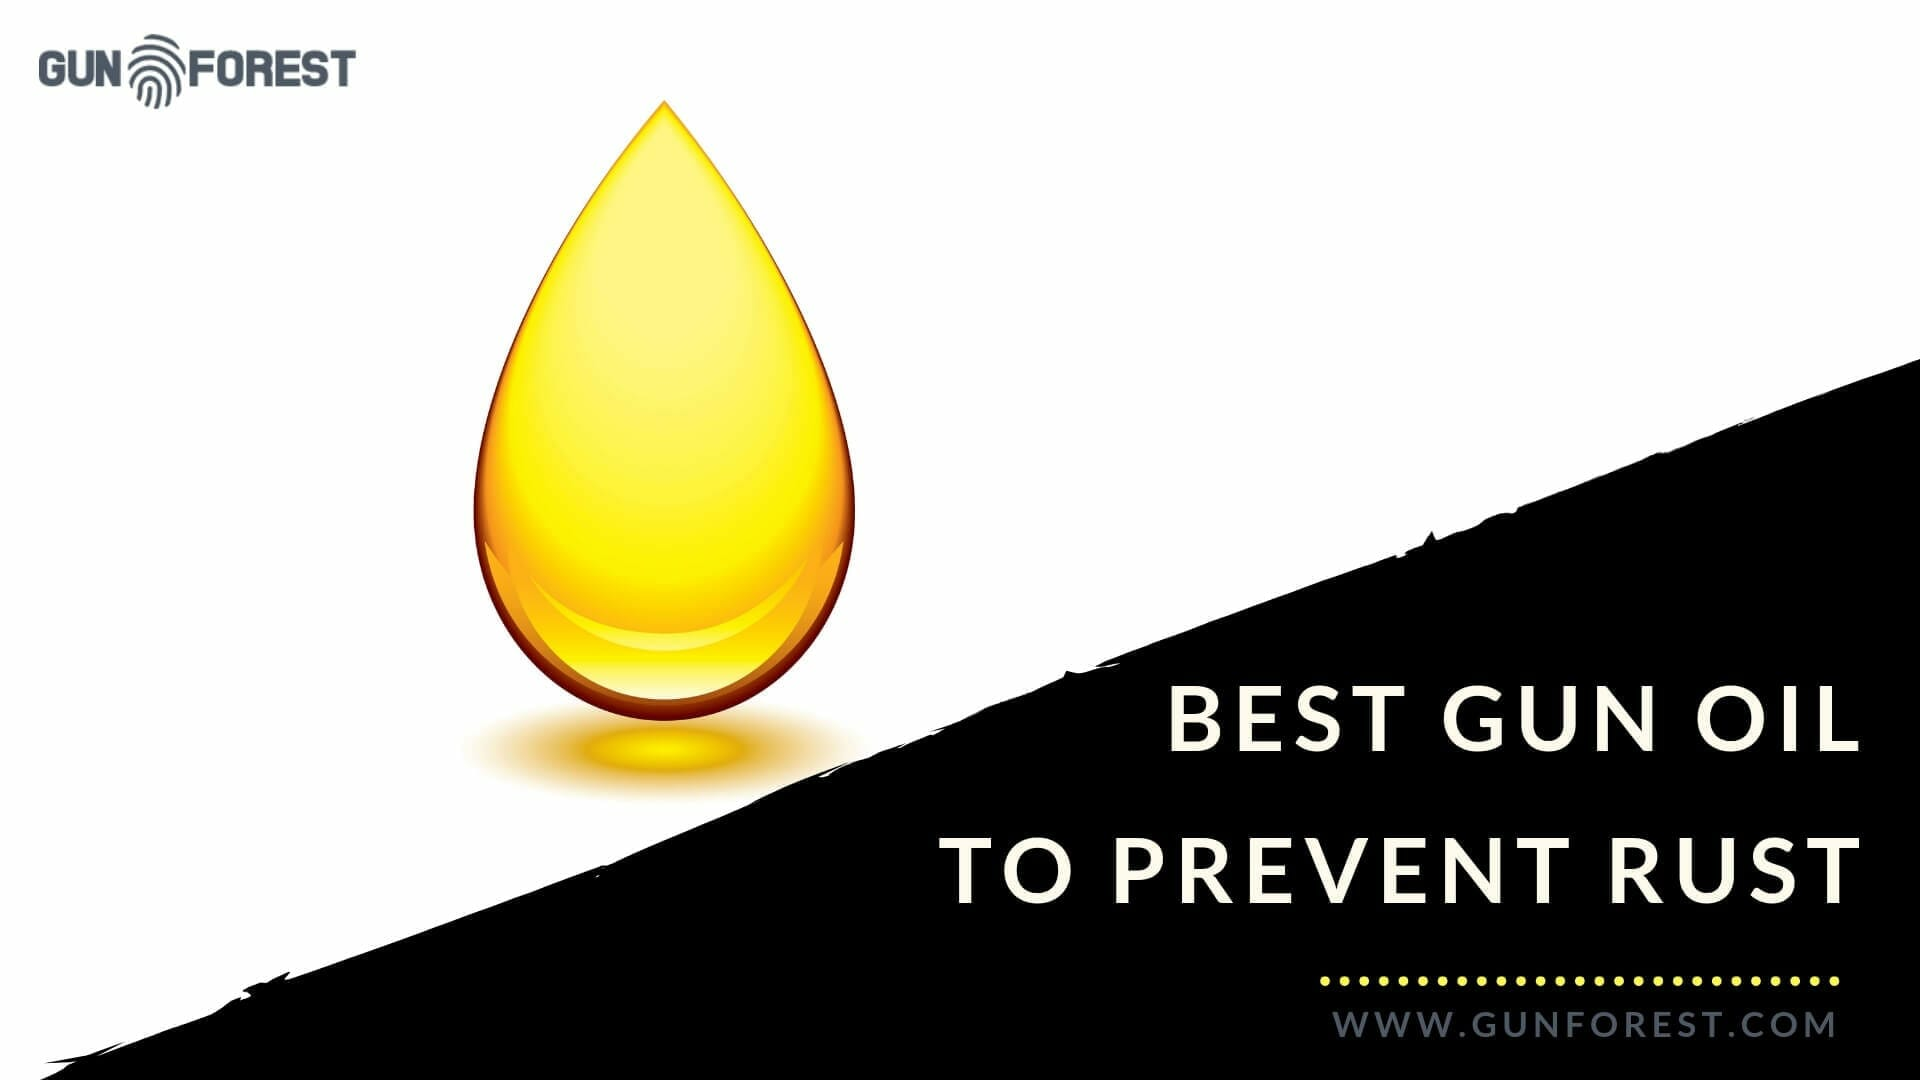 Best Gun Oil to Prevent Rust